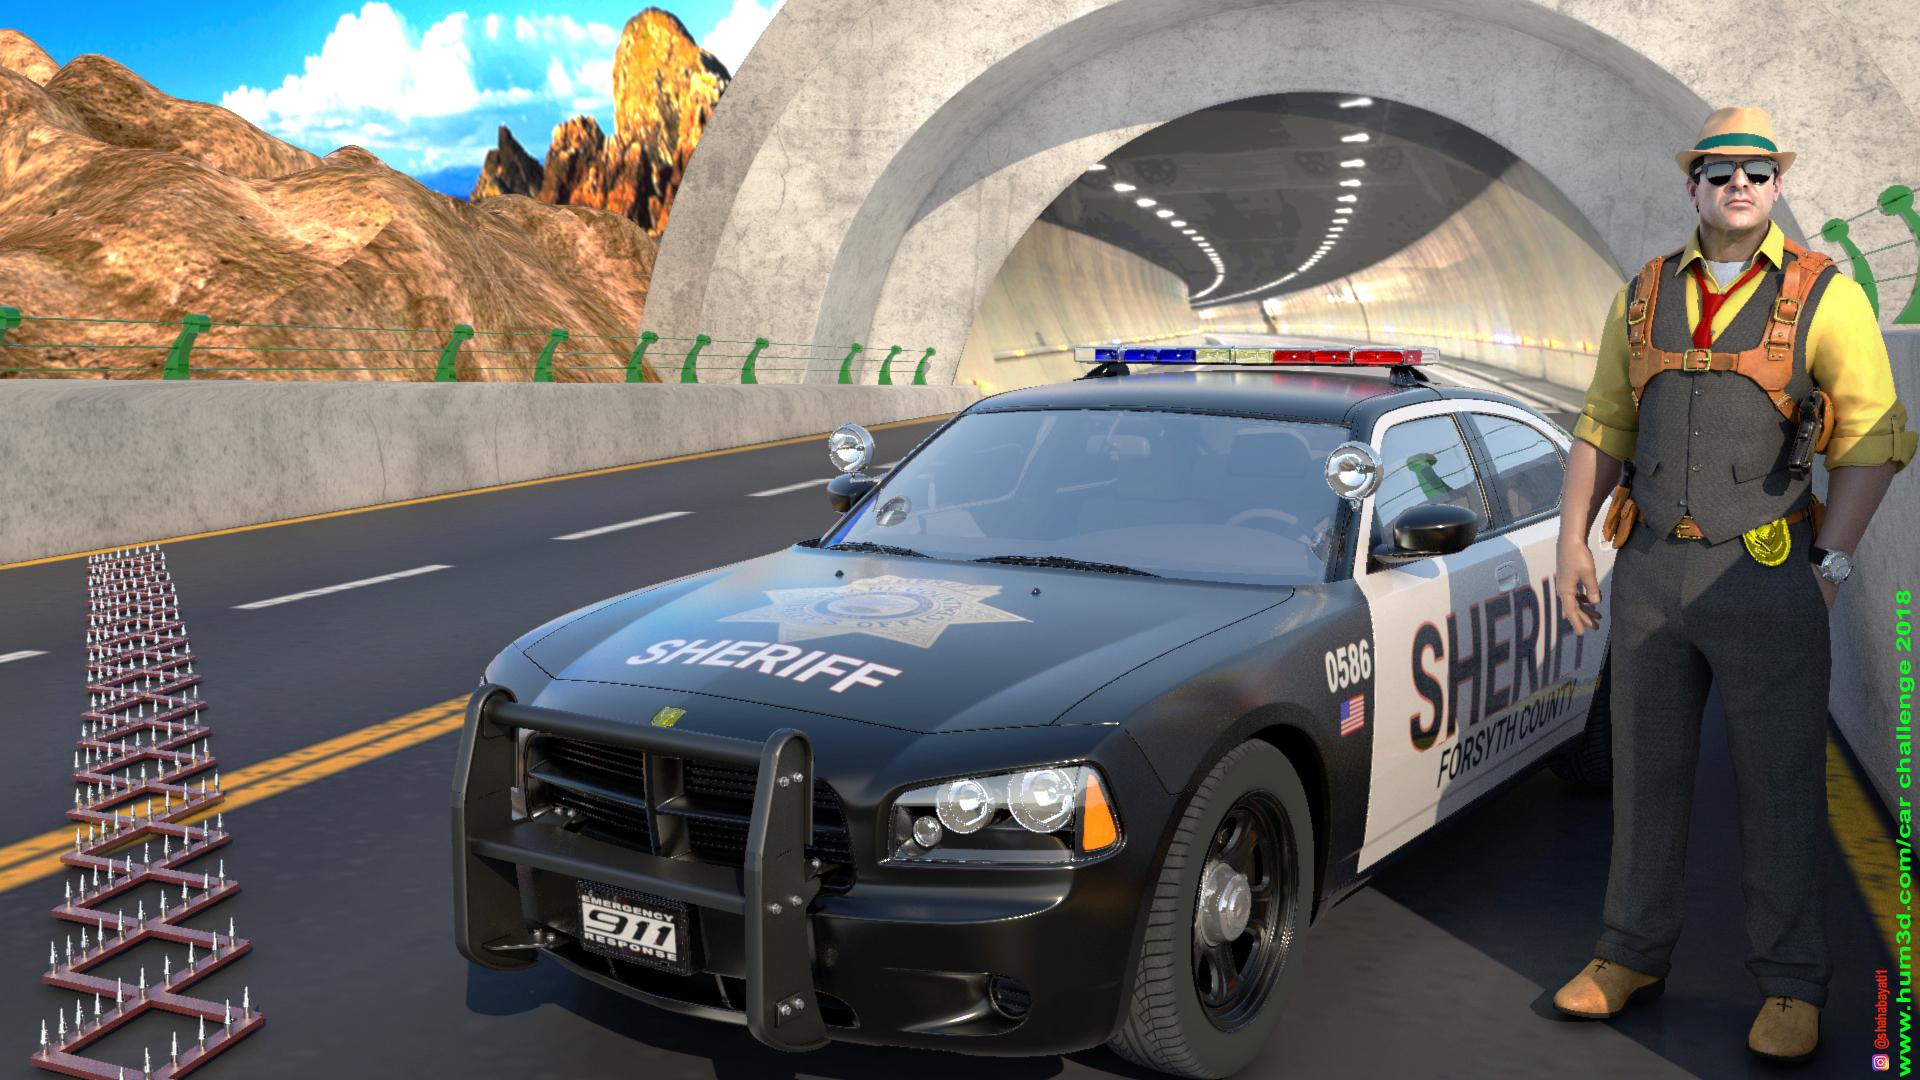 Sheriff 3d art